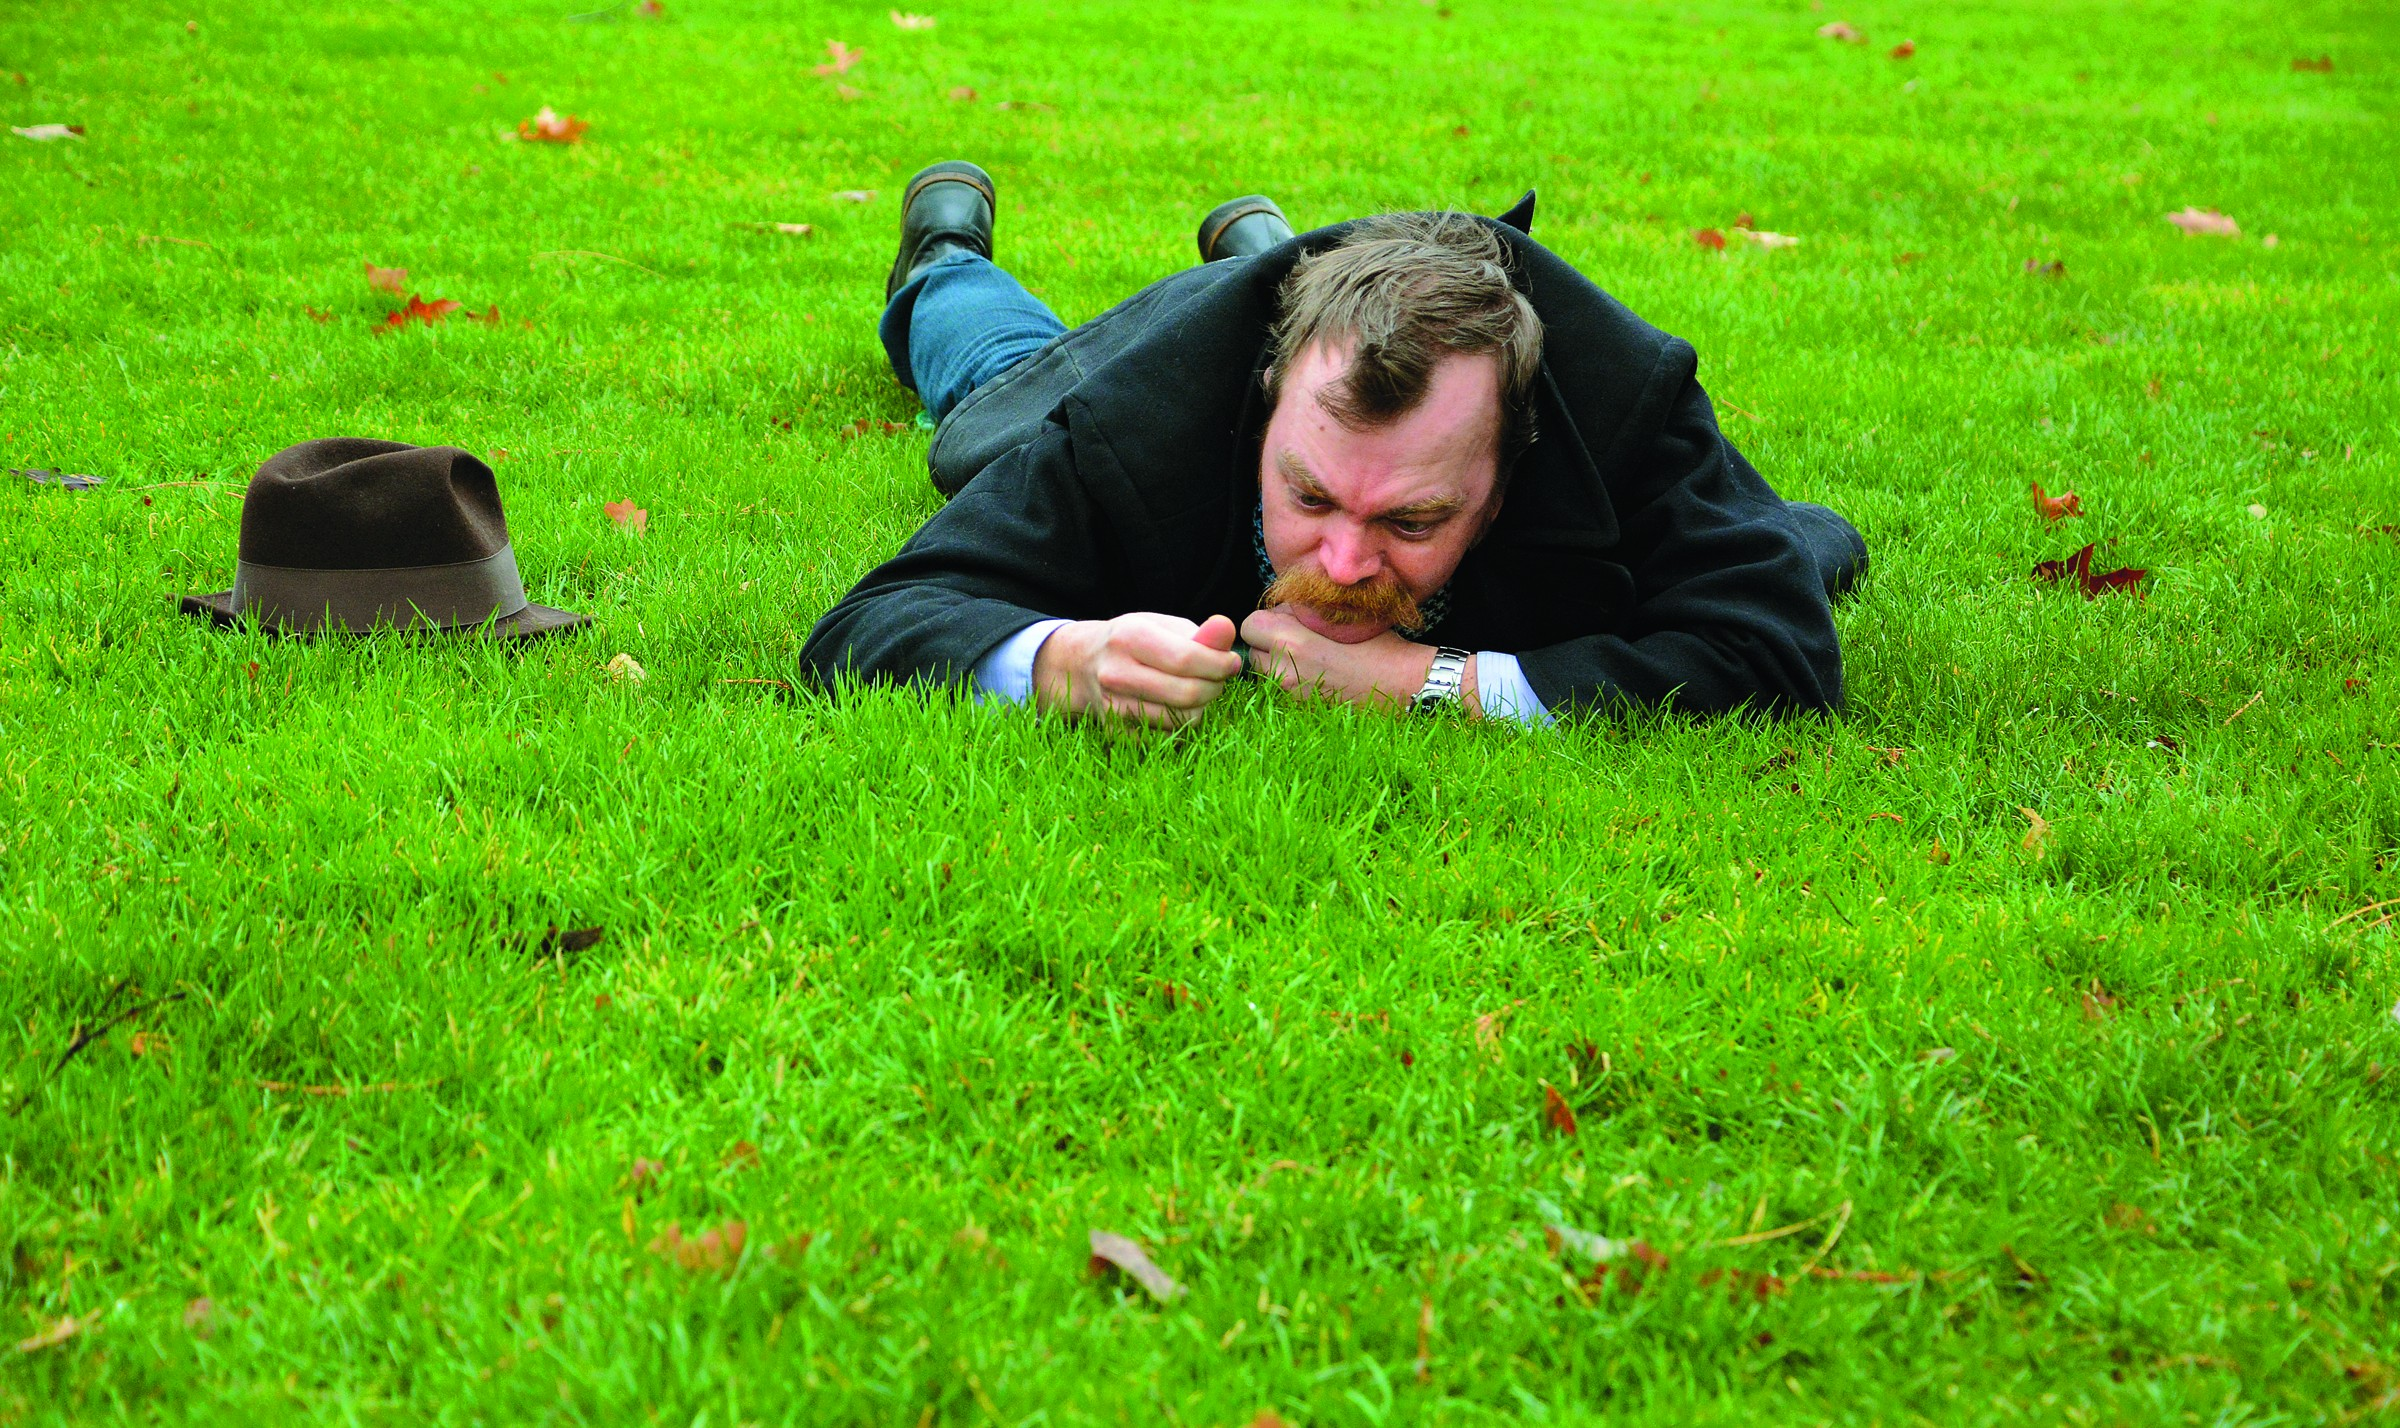 watching grass grow - TRIBUNE/BARRY KOUGH